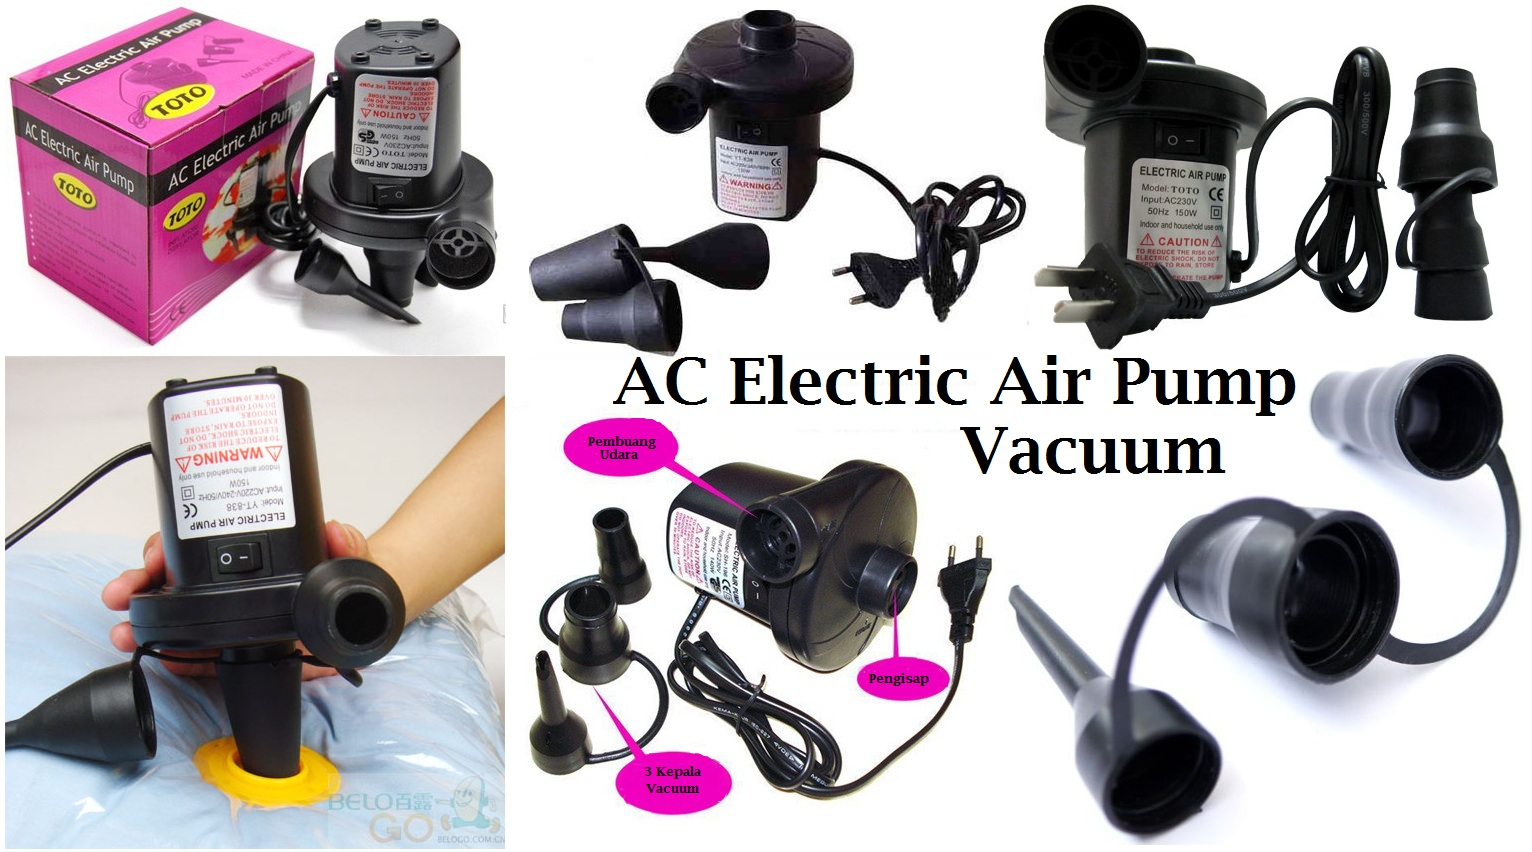 Jual Electric Vacuum Pompa Vacum Listrik Kasur Angin Vakum Elektrik Ban Les Souvenirs Indonesia Tokopedia